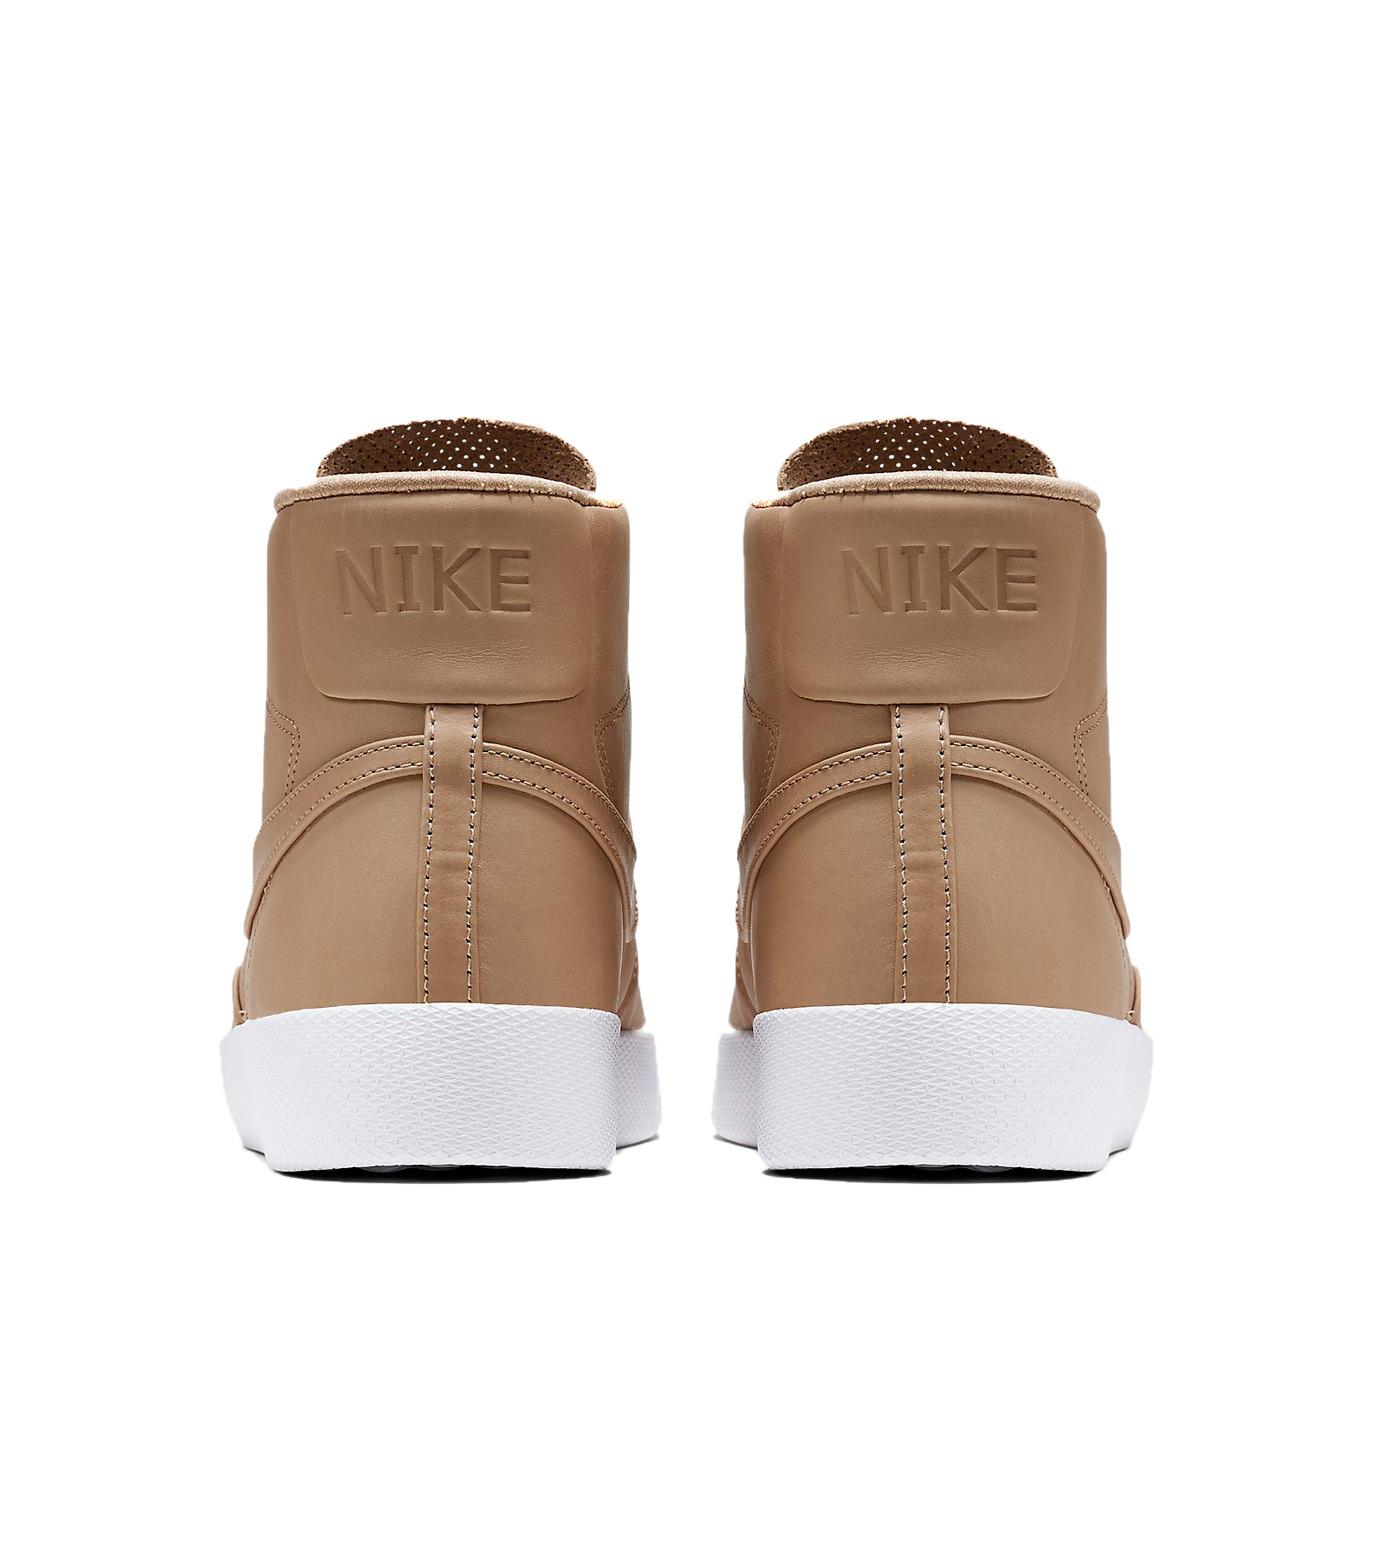 NIKE(ナイキ)のNIKELAB BLAZER ADVNCD-BEIGE(シューズ/shoes)-874775-200-52 拡大詳細画像5